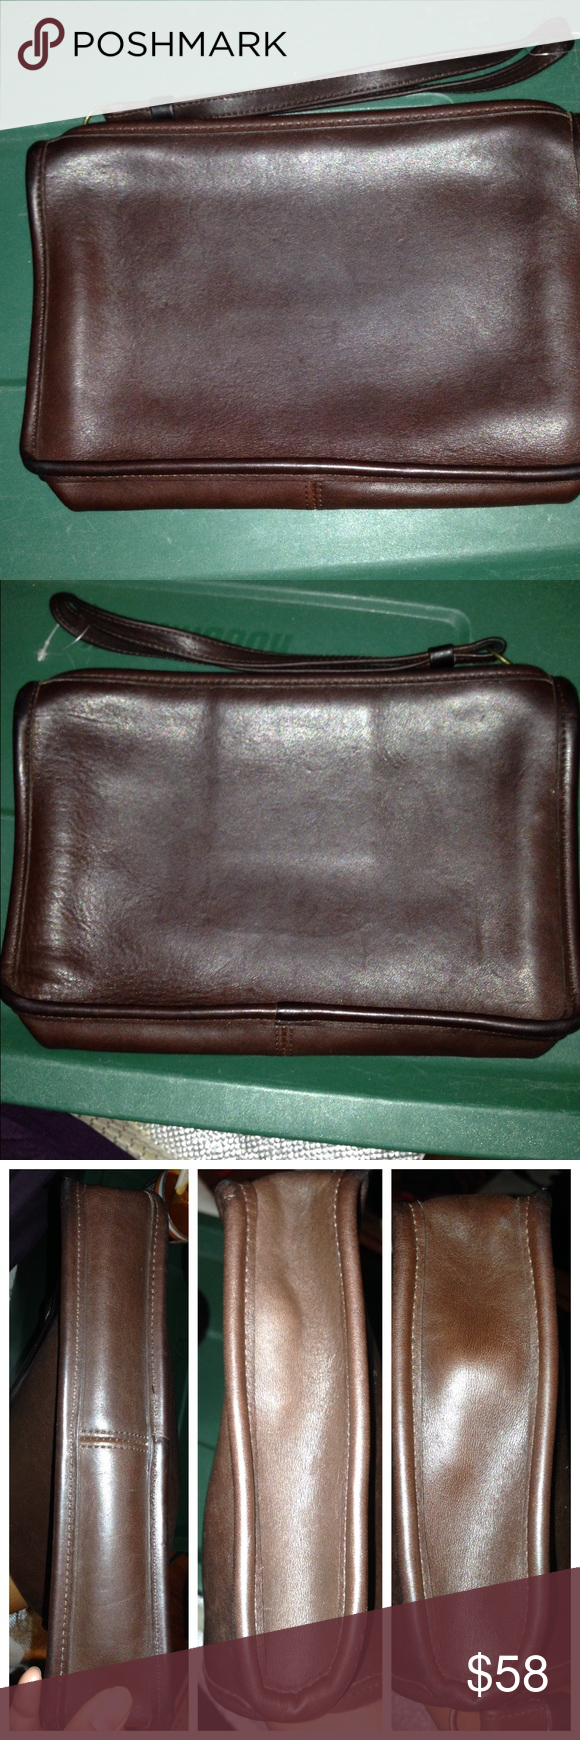 Sale Vtg Coach 9972 Chocolate Clutch Wristlet U Leather